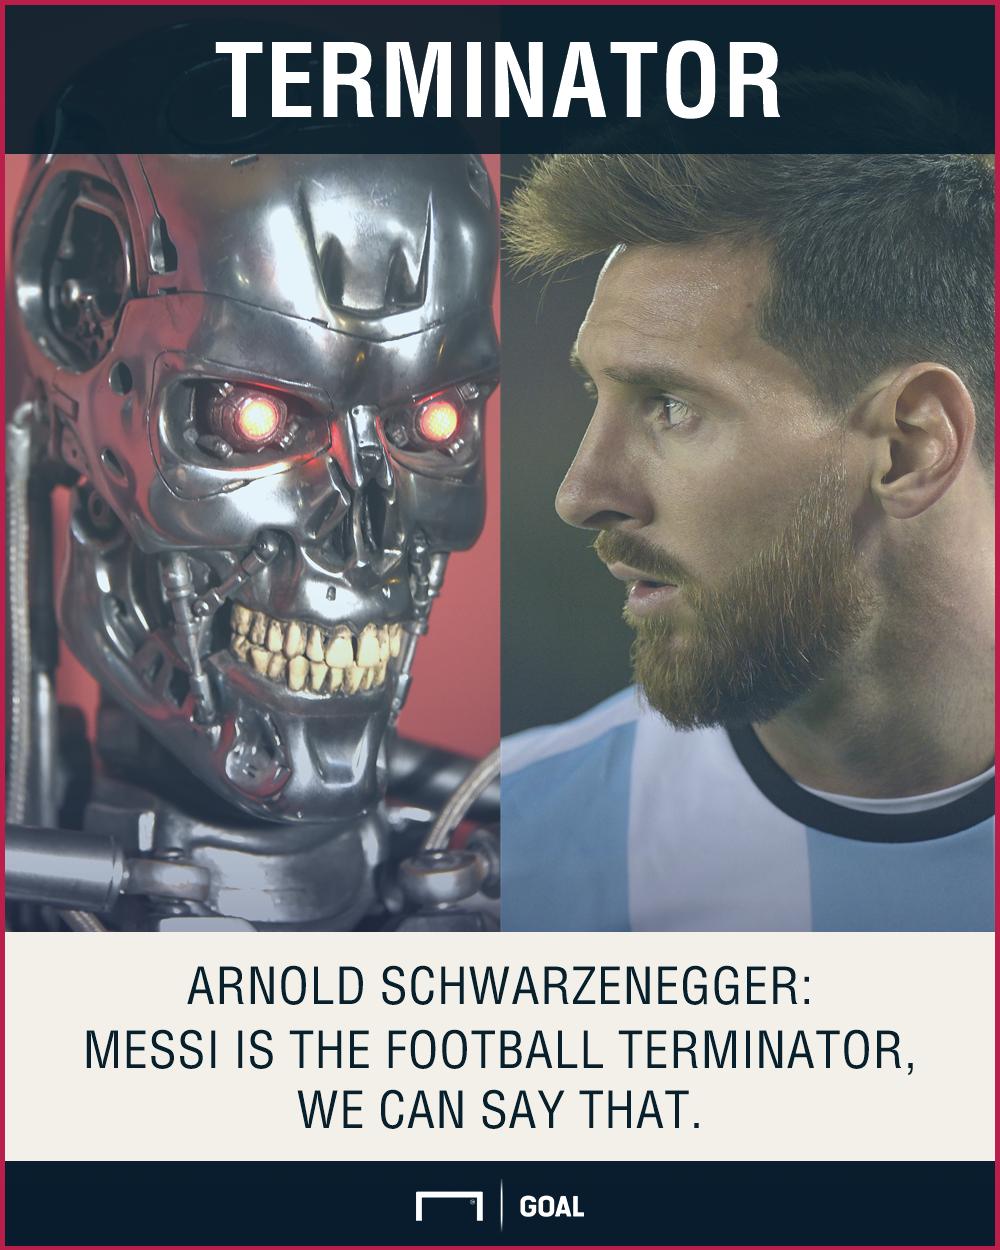 Lionel Messi Arnold Schwarzenegger Terminator